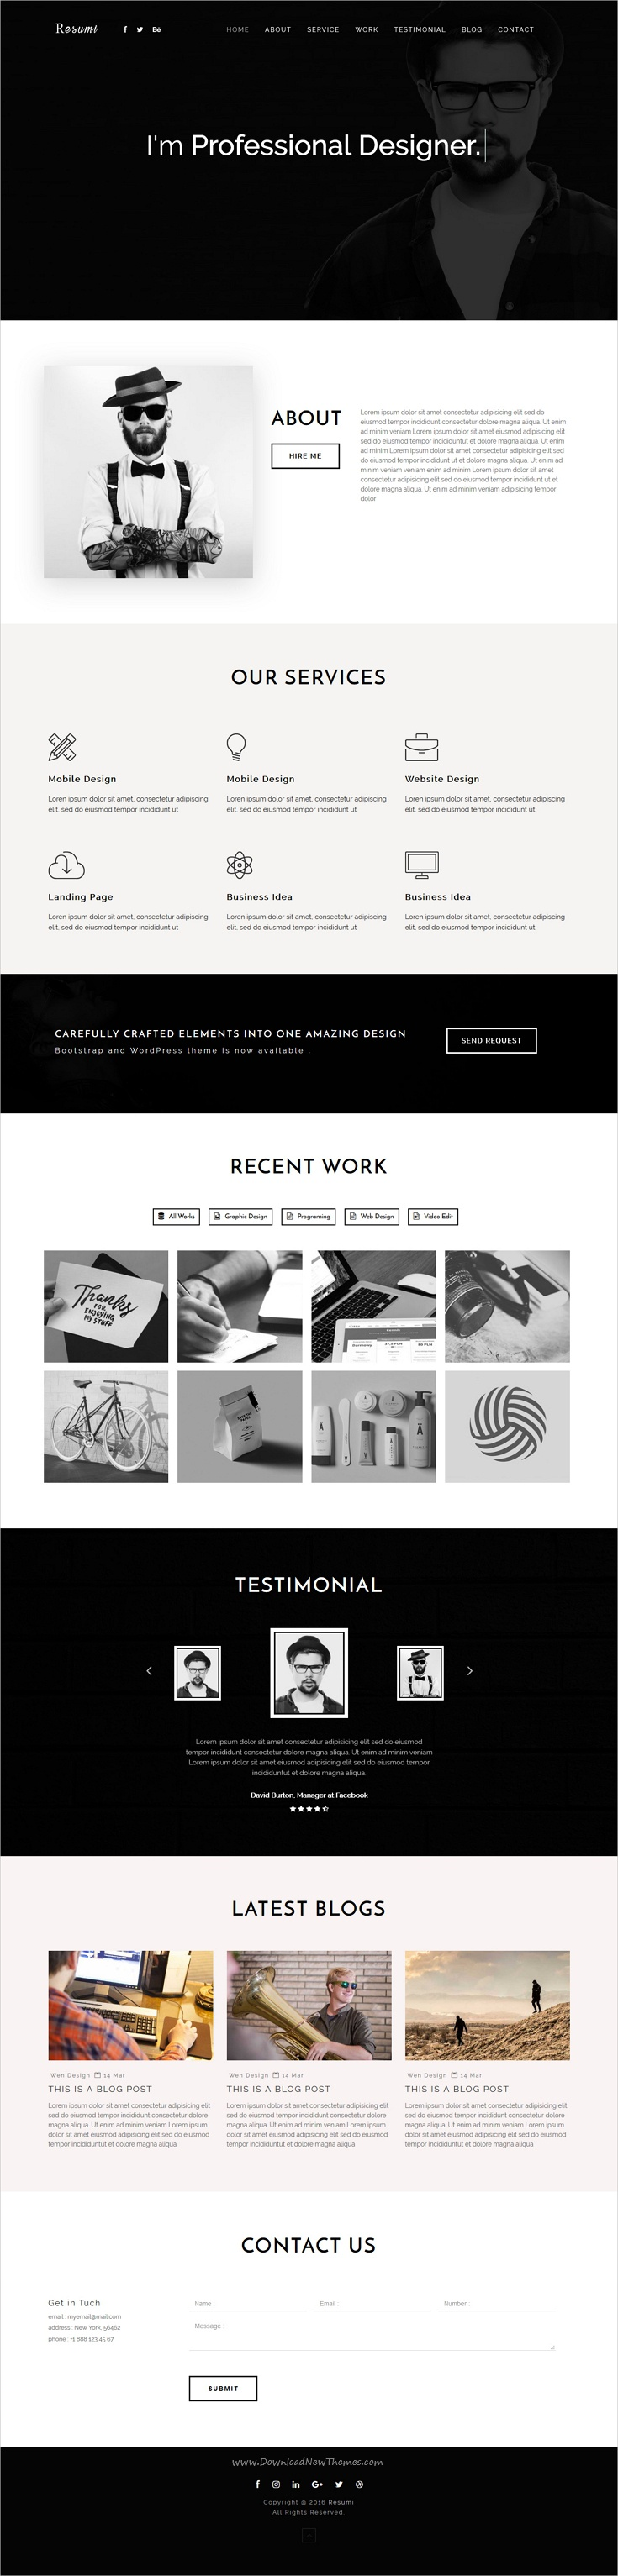 resumi responsive resume personal portfolio template pinterest